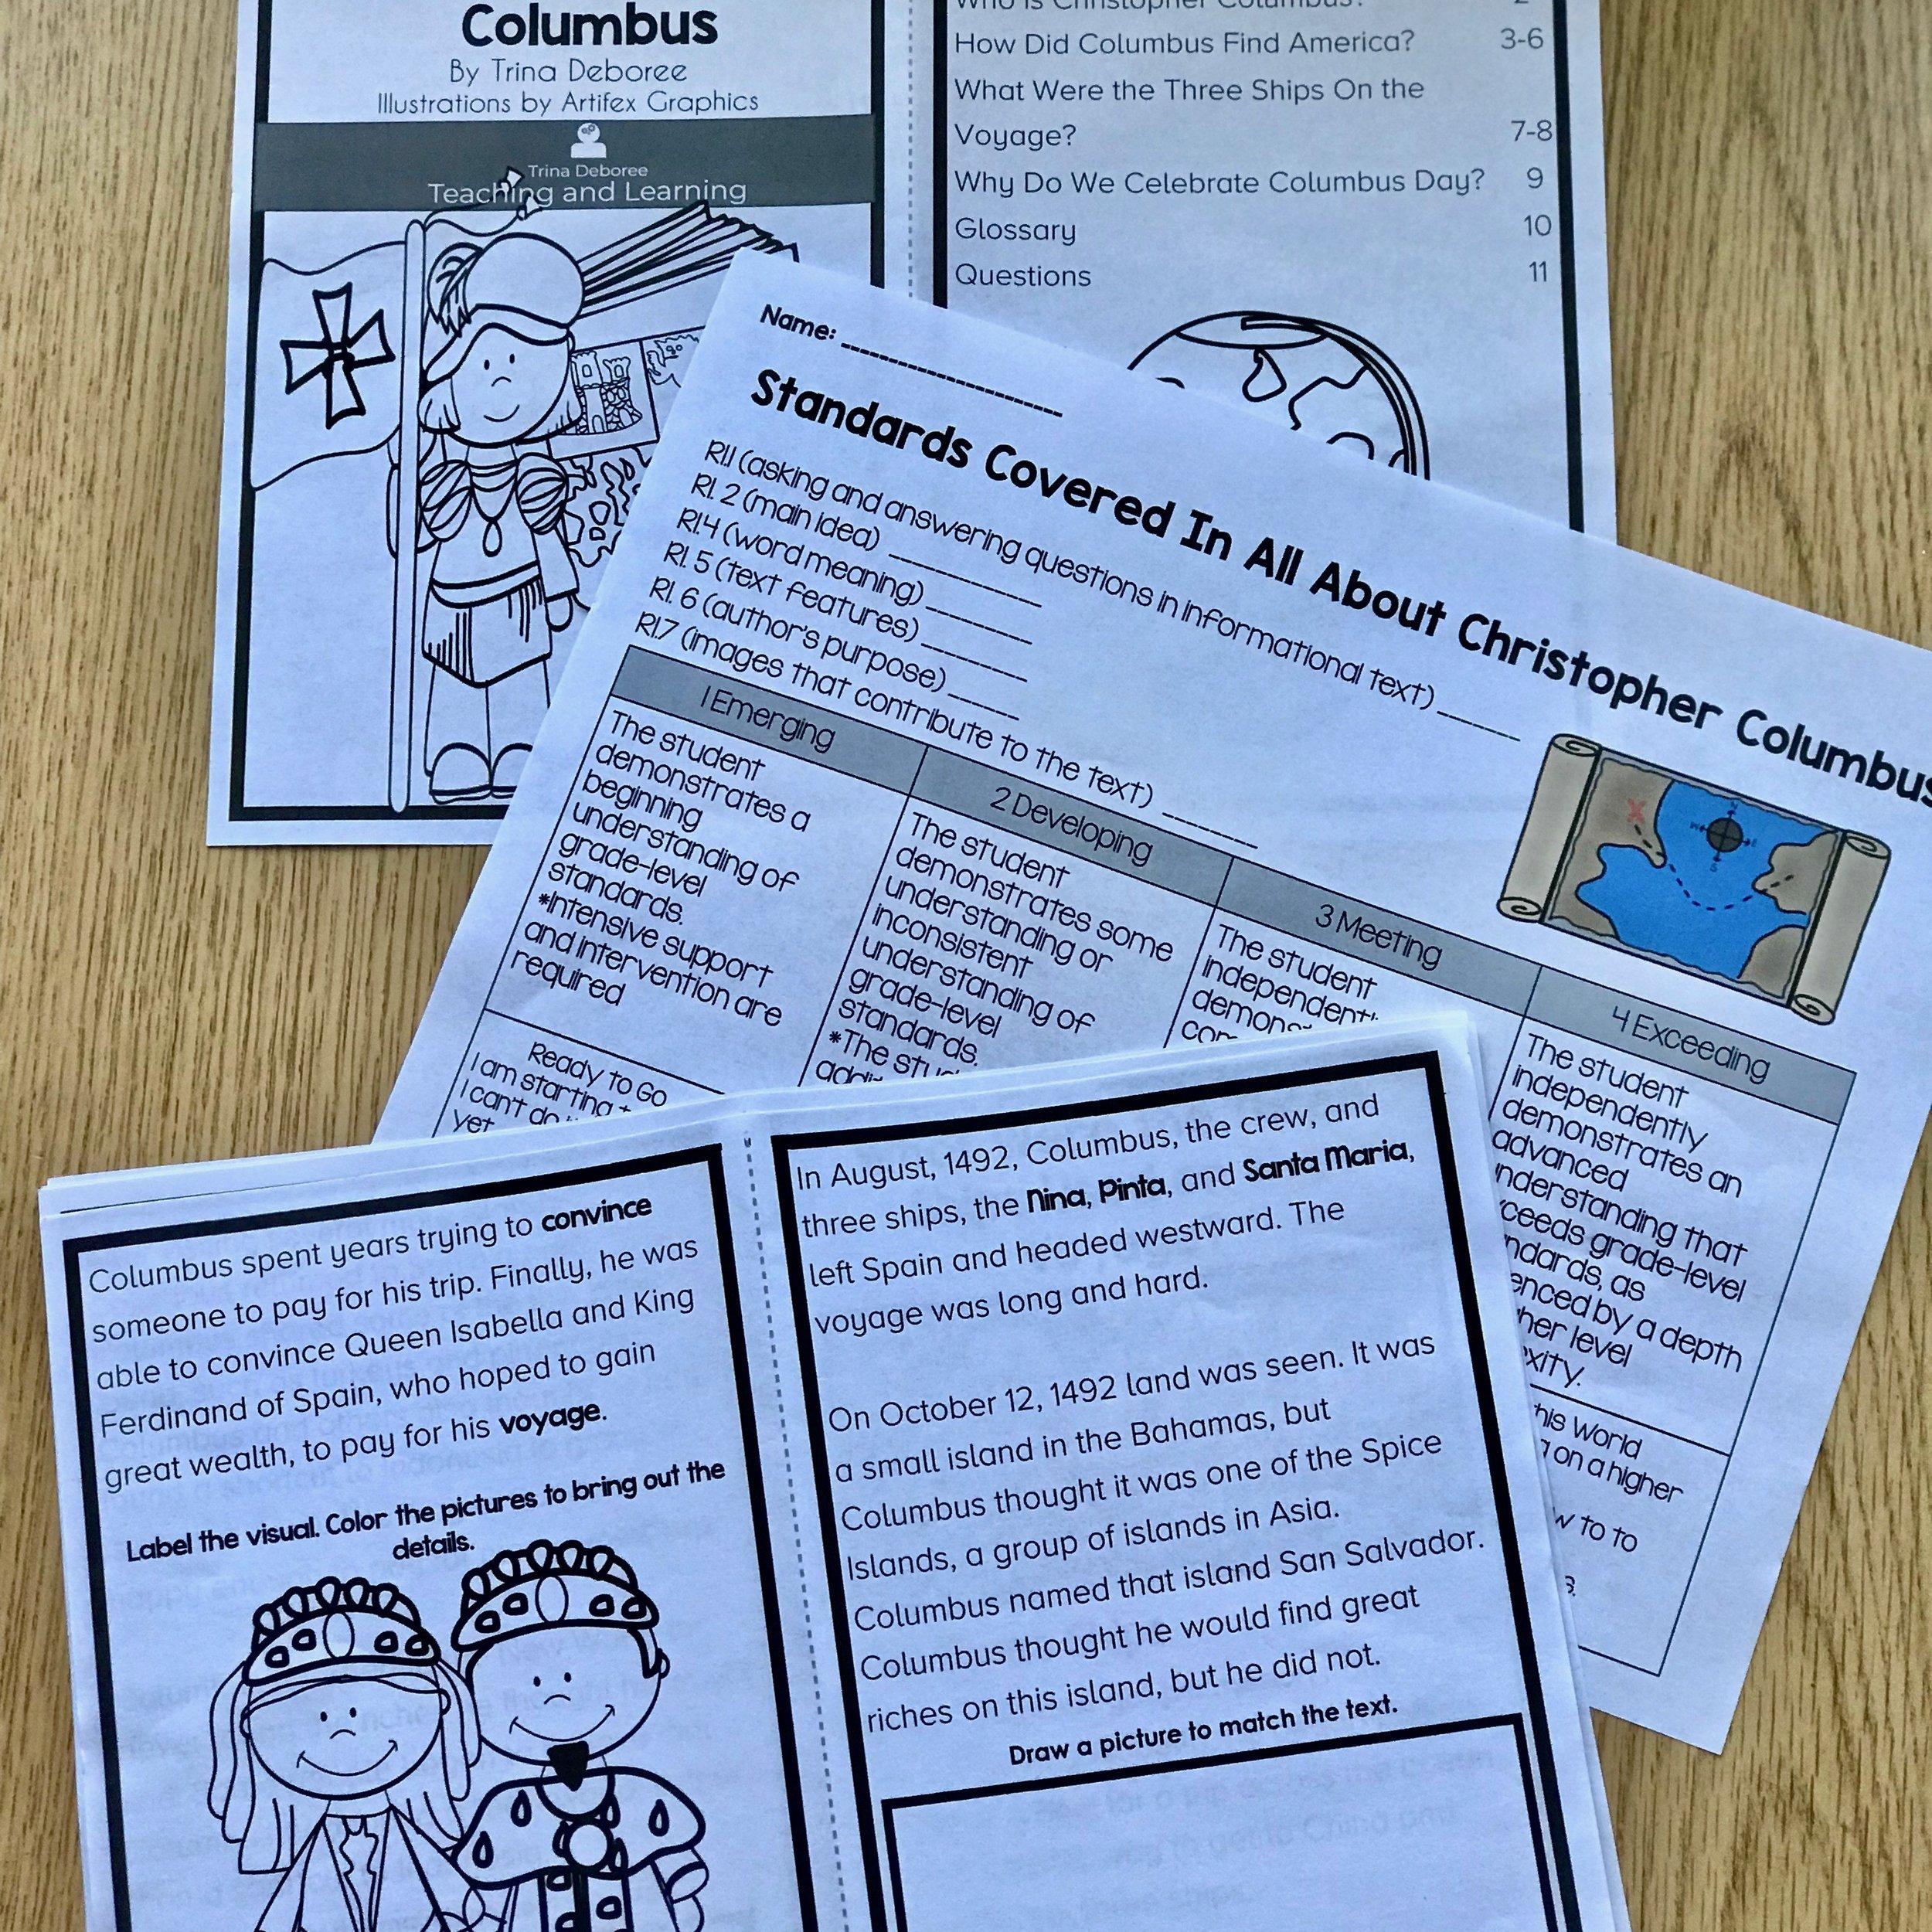 Christopher Columbus reader #christophercolumbus #christophercolumbusactivities #christophercolumbuscraft #christophercolumbusfacts #christophercolumbushistory #christophercolumbusprojects #christophercolumbusprintables